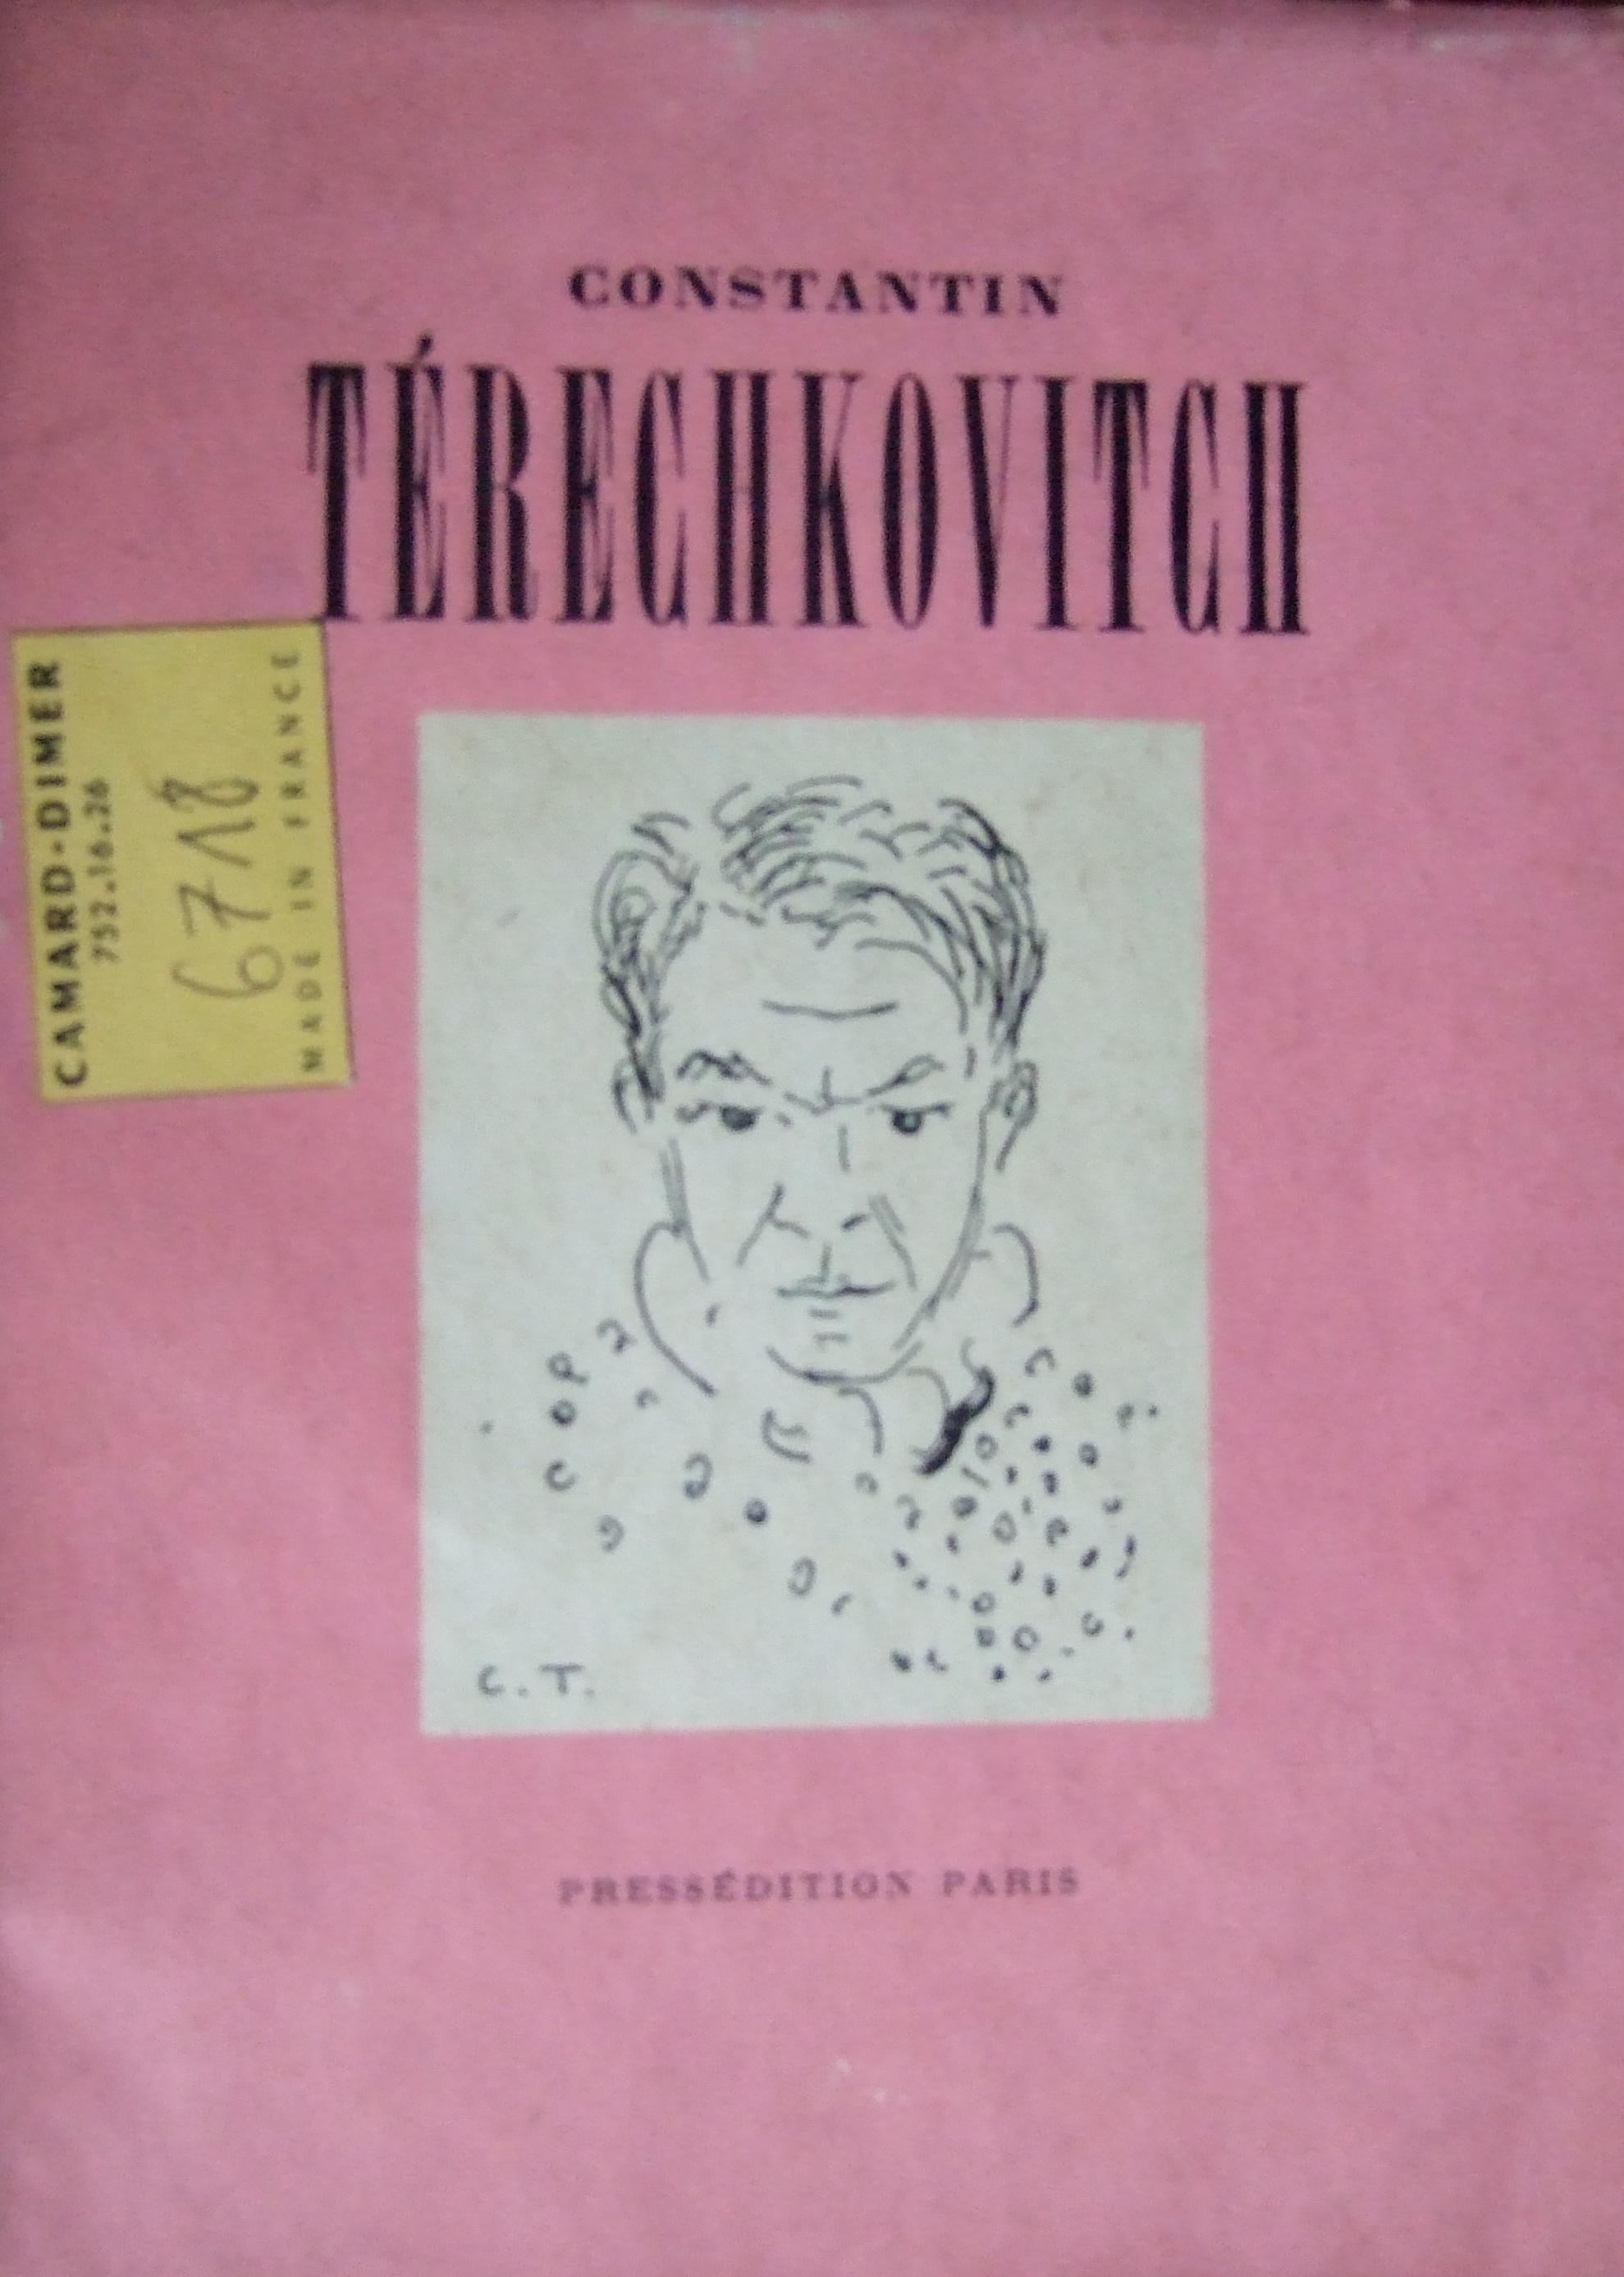 Terechkovich Constantin by Maximilien Gauthier